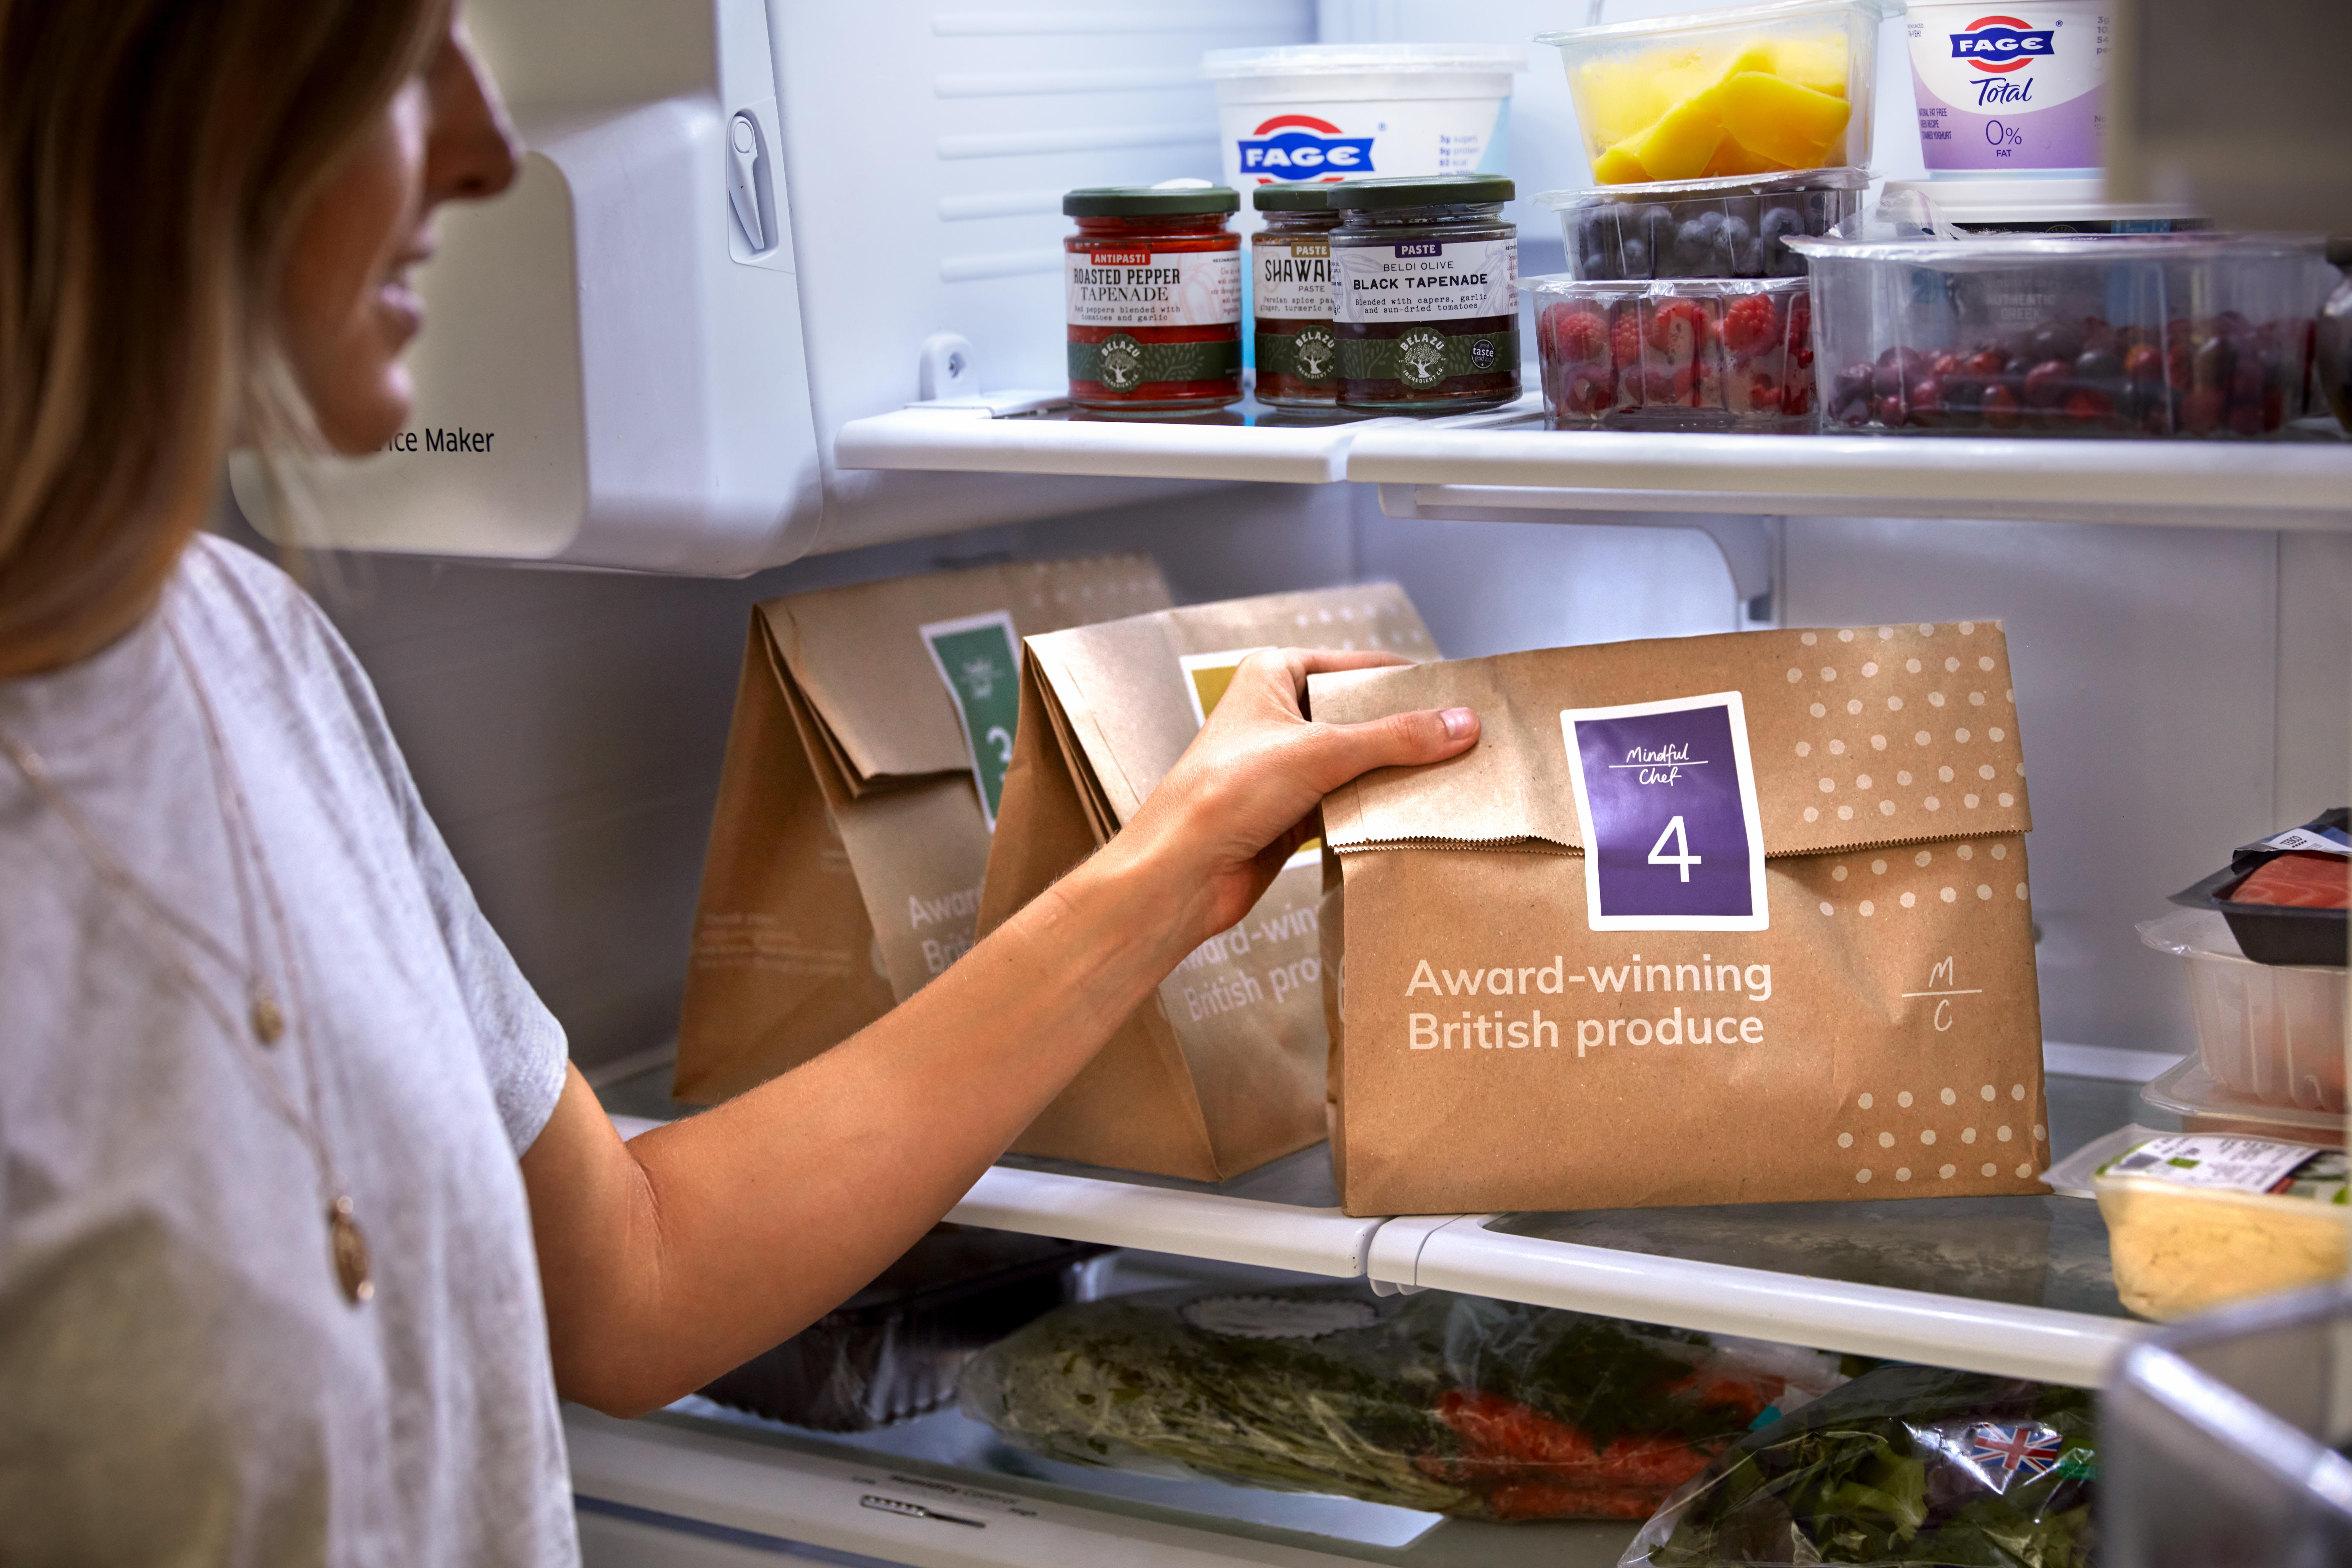 Lifestyle - 8 -20 - Day 2 - Liv fridge 1